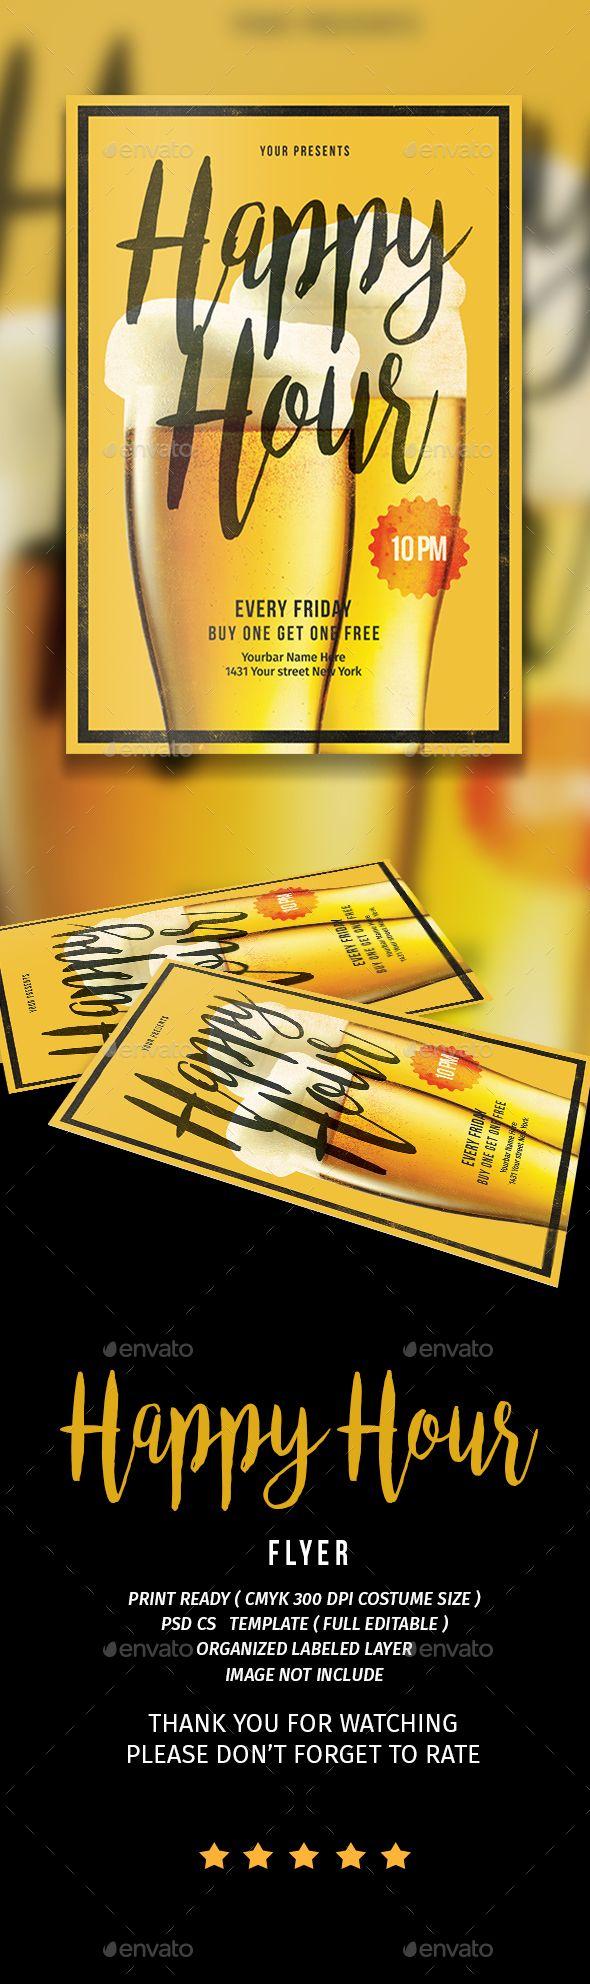 best images about food drink flyer template happy hour vol 3 drinks chalkboardchalkboard flyertemplate